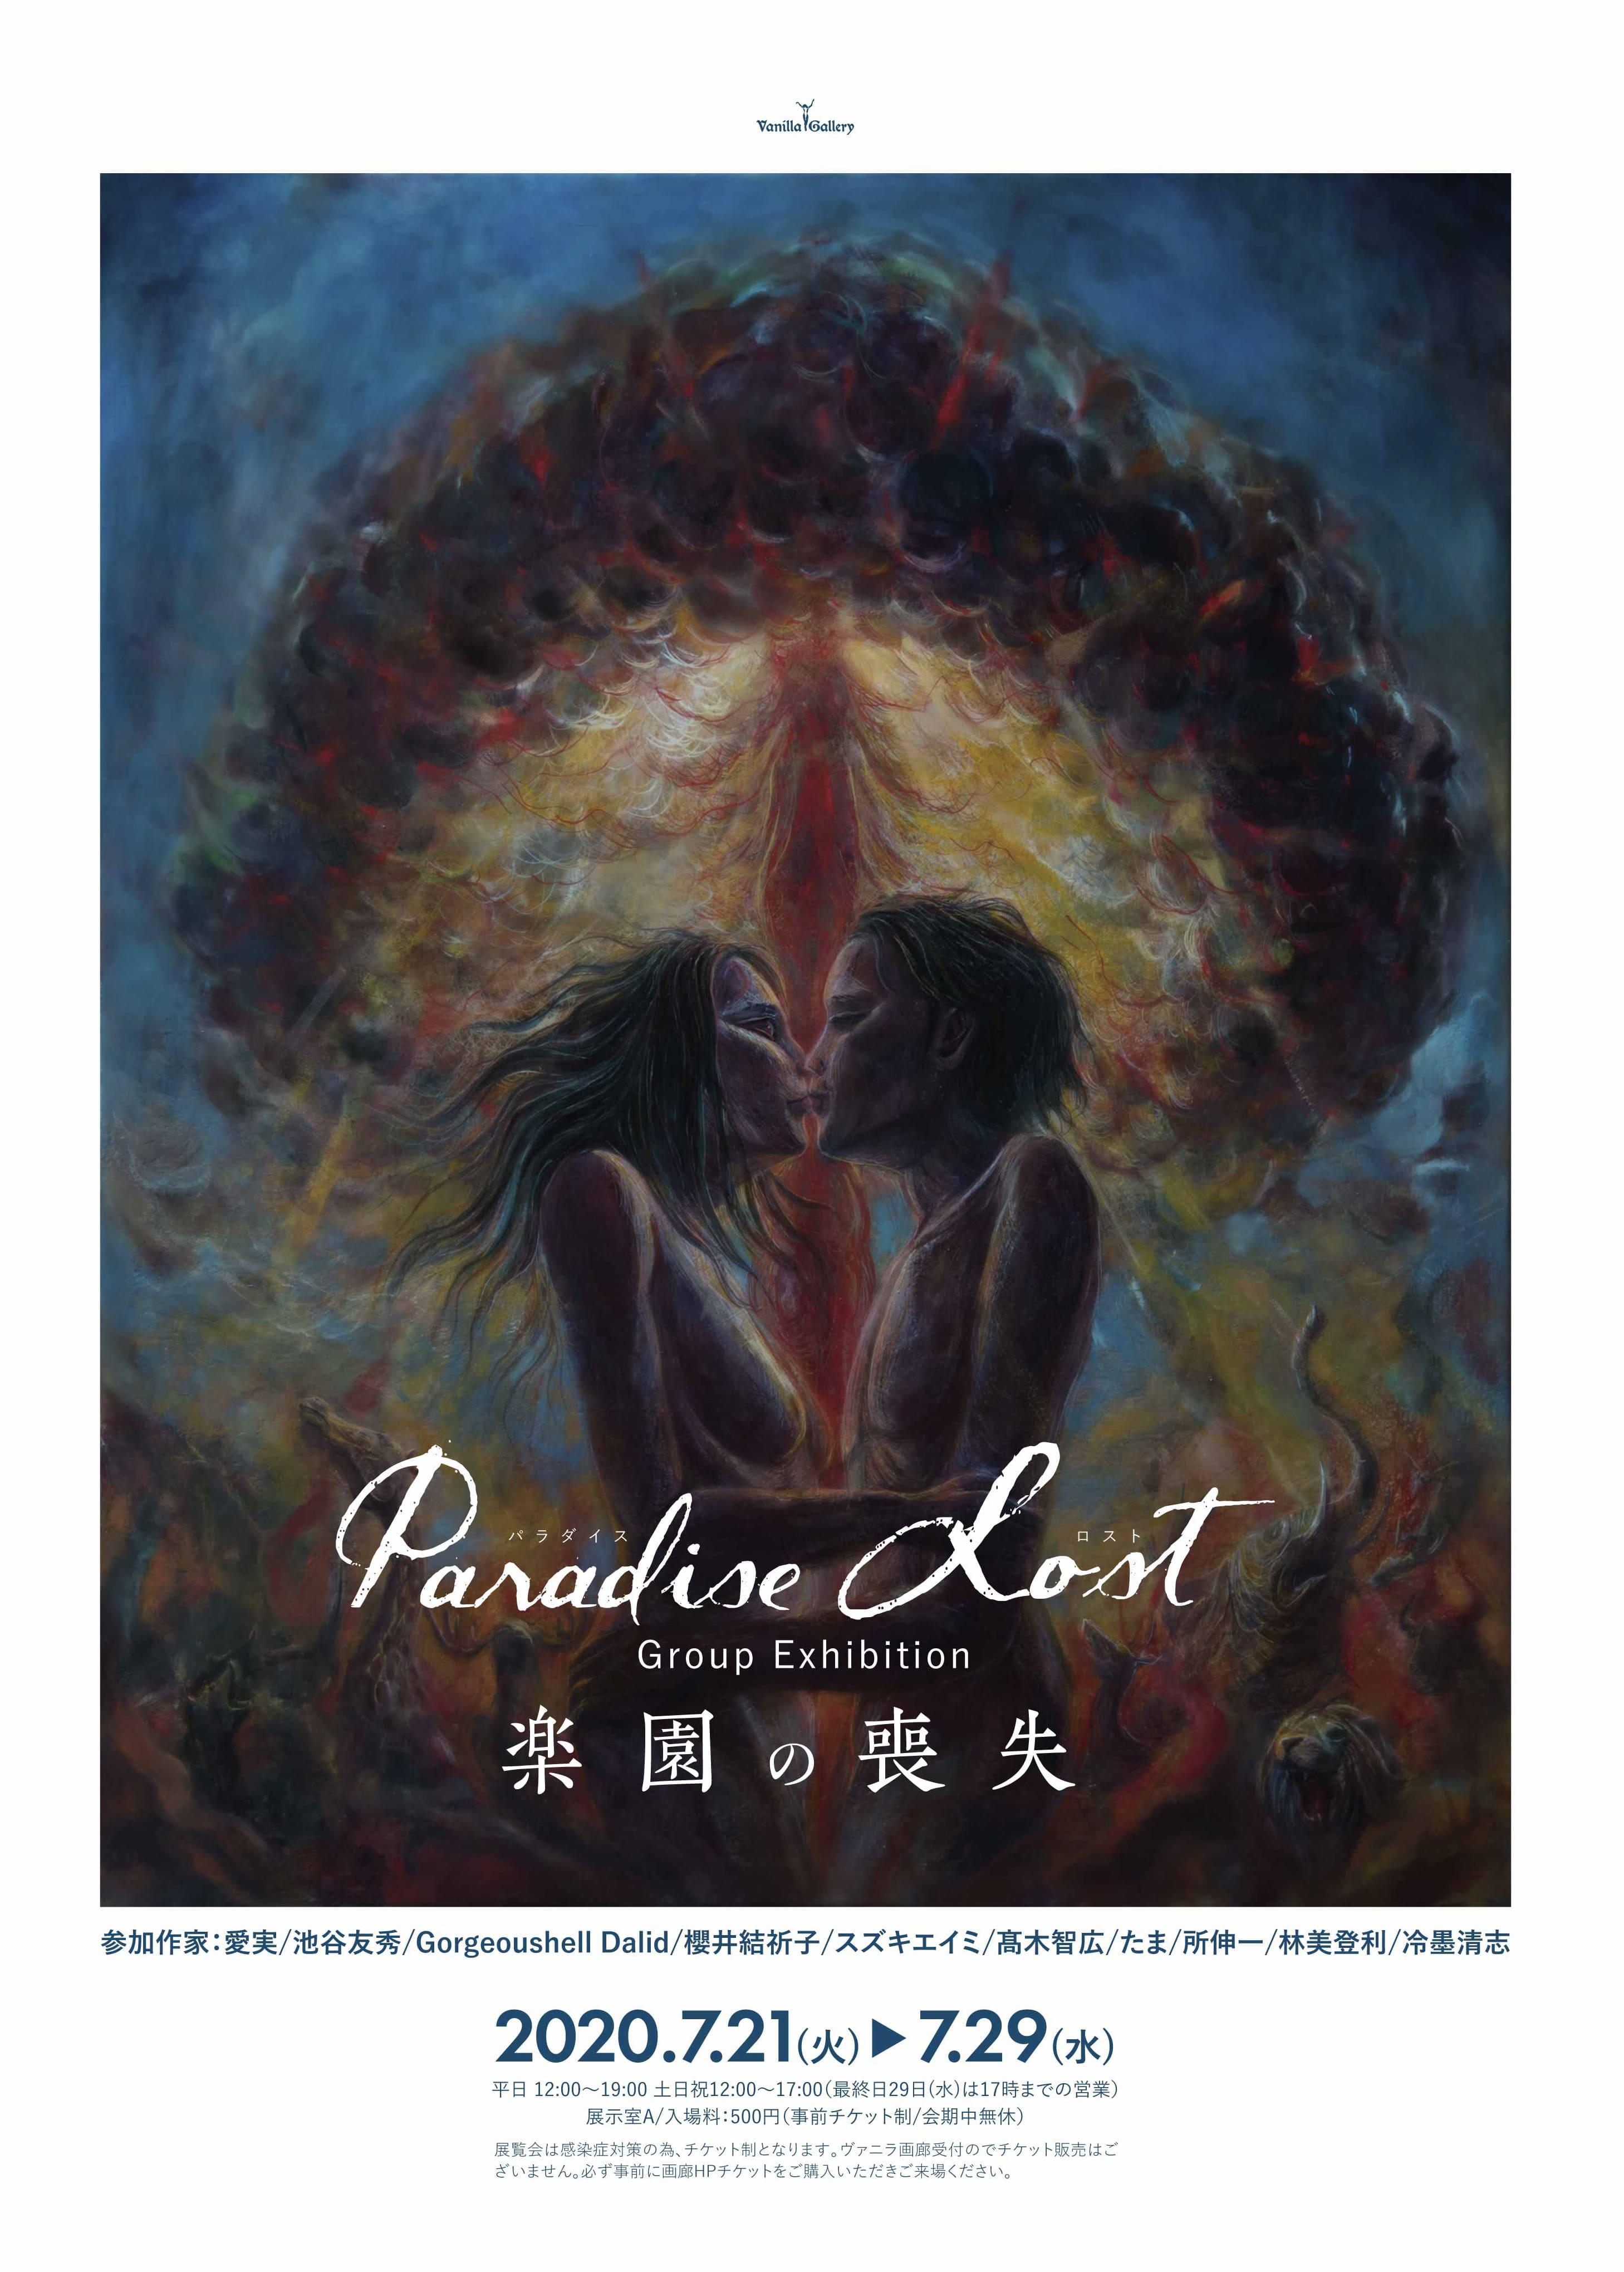 「Paradise Lost ~楽園の喪失~」グループ展 7月25日チケット